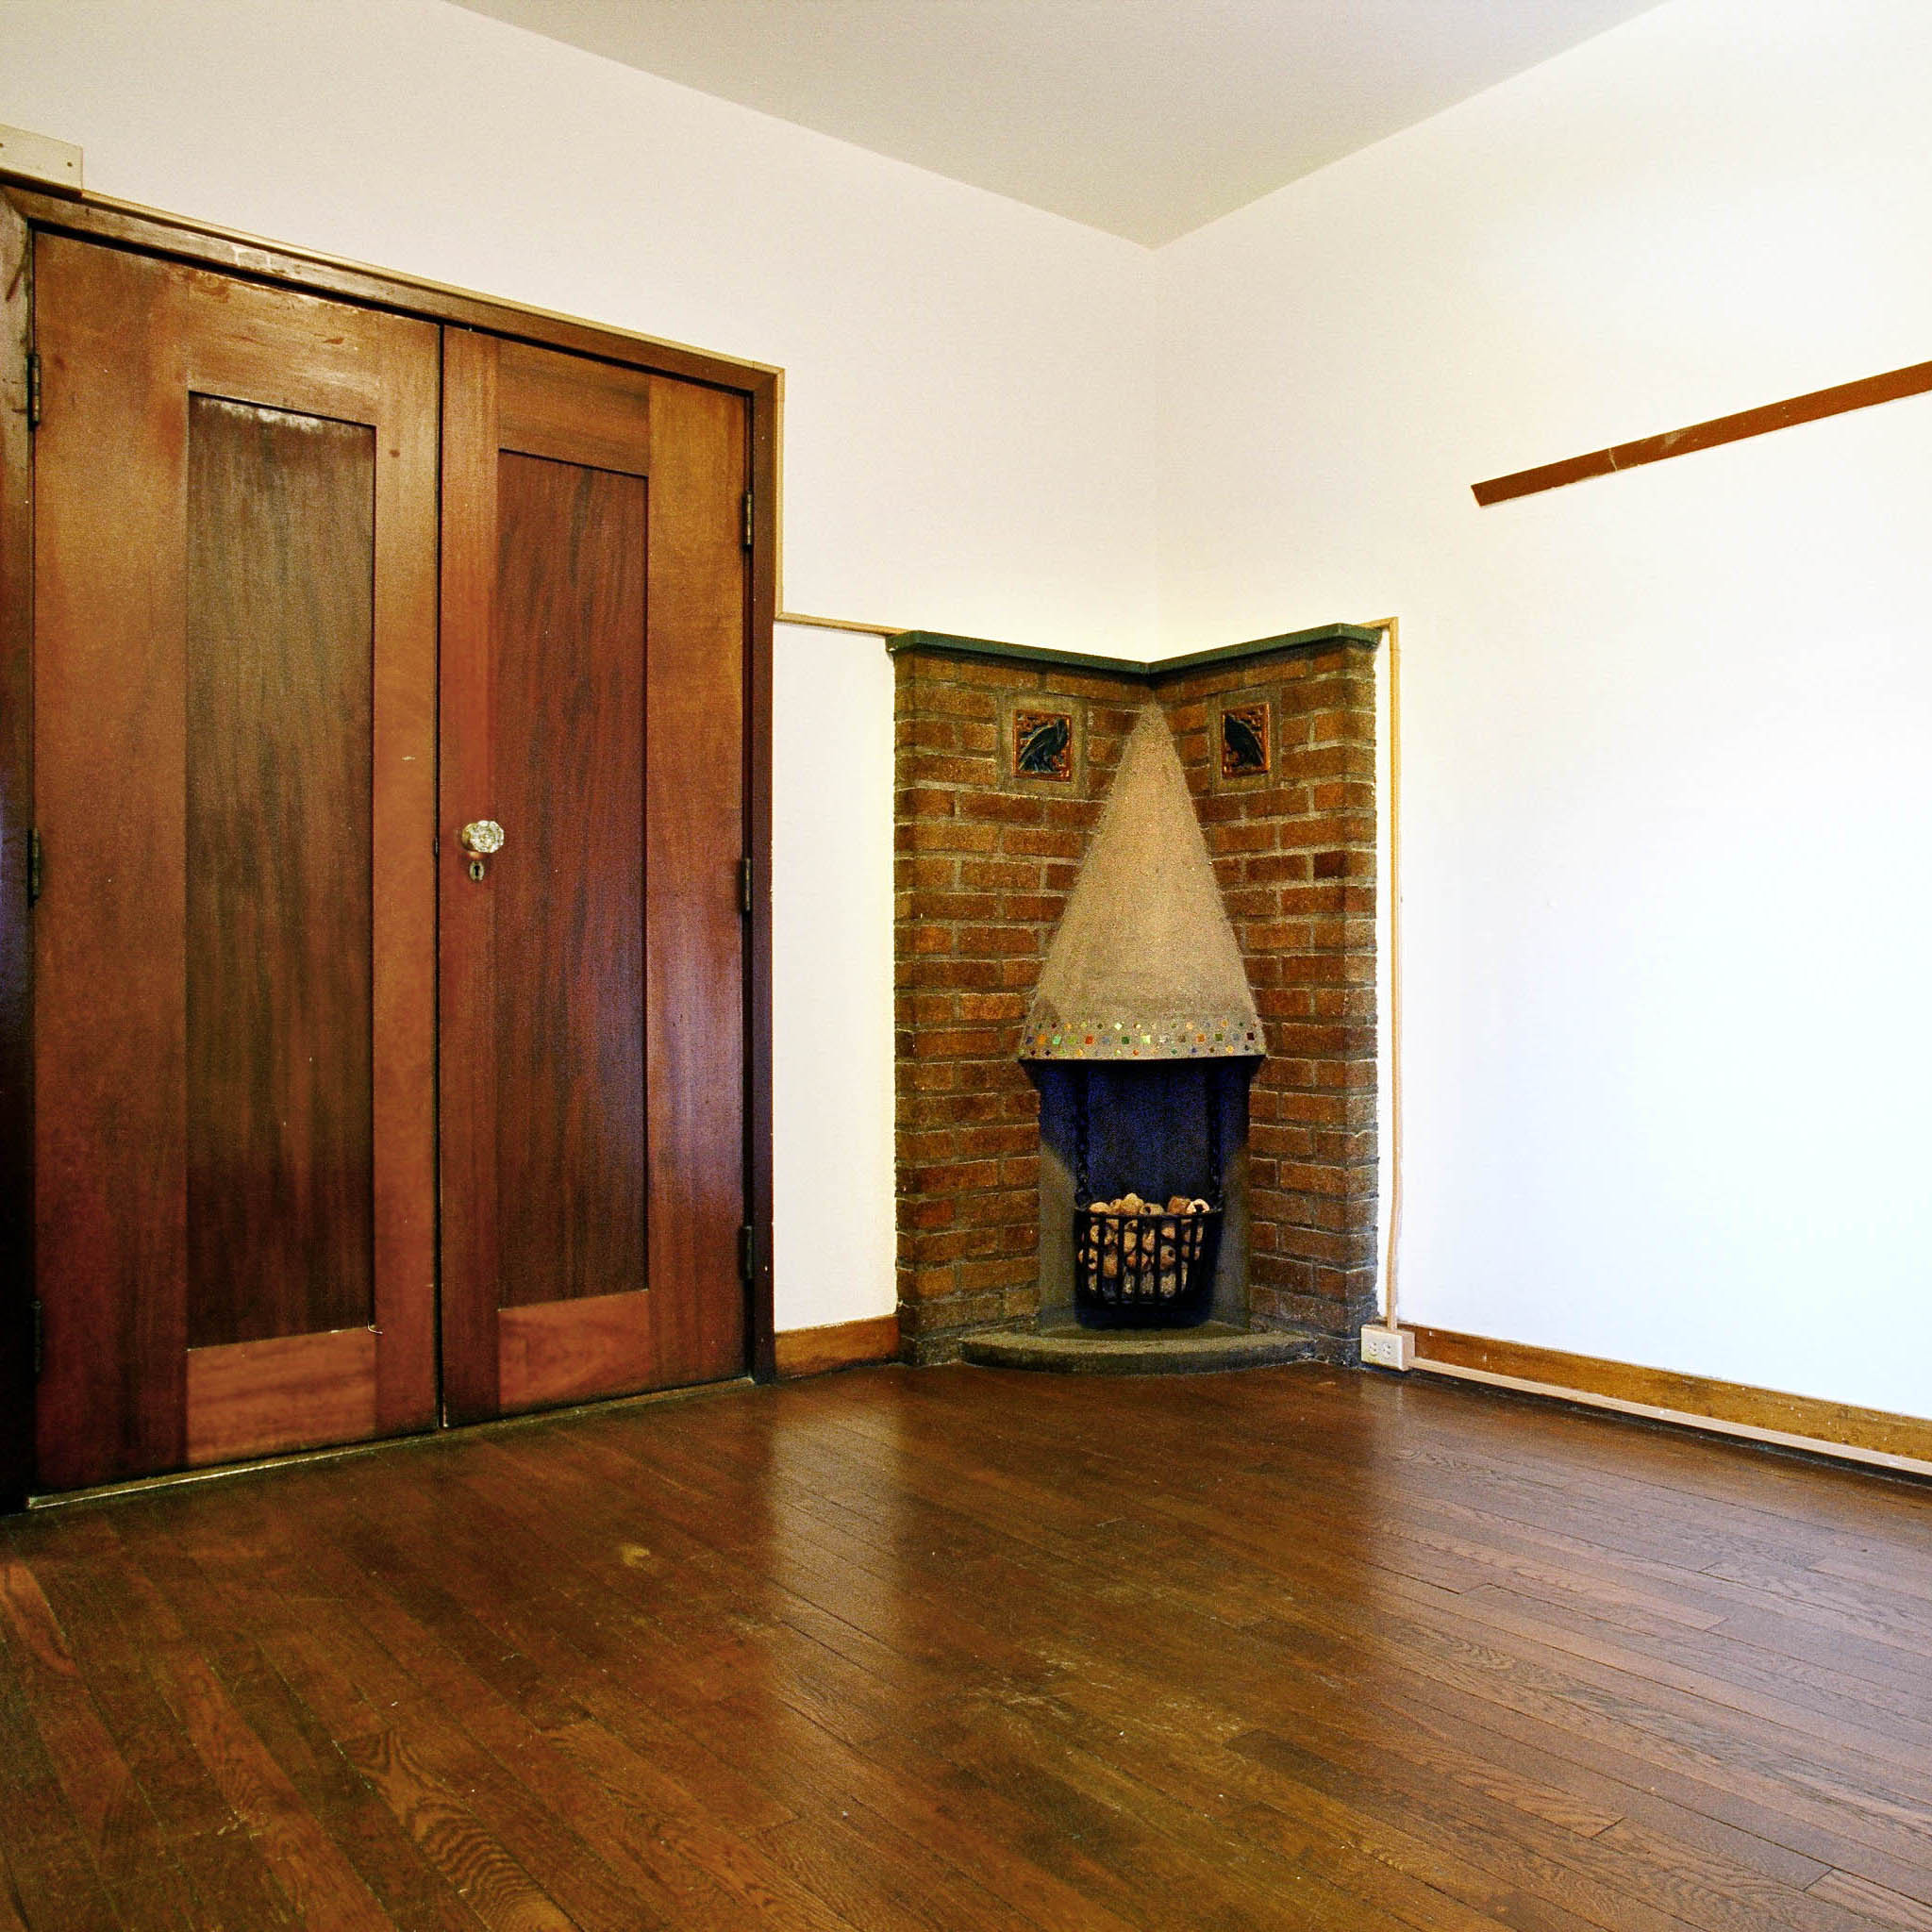 interior of 340 S. Highland Ave, Apt. 5B 1